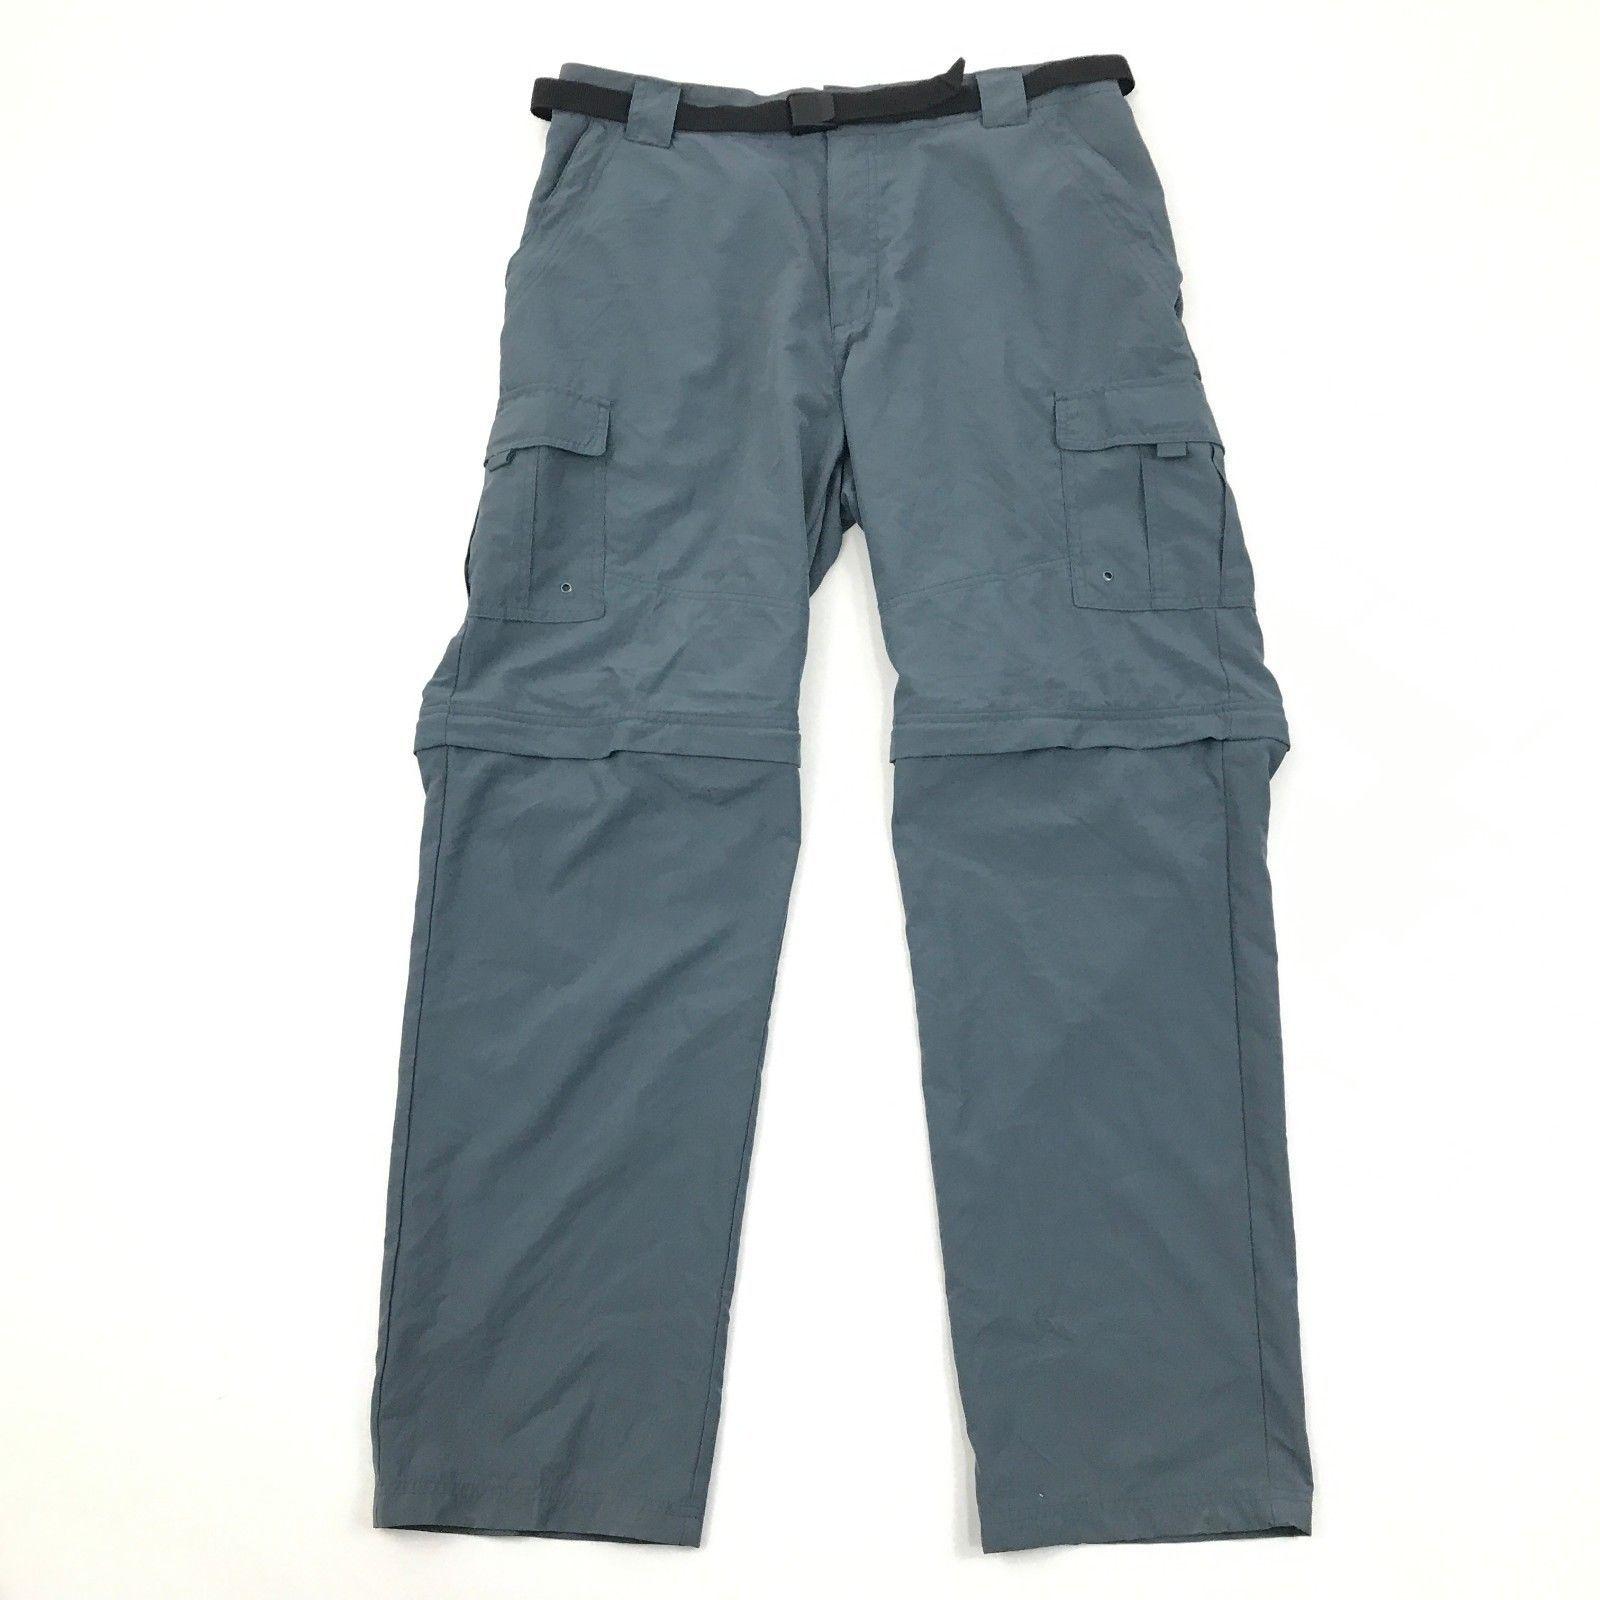 Rugged Exposure Convertible Pants Xl Adult Nylon Water